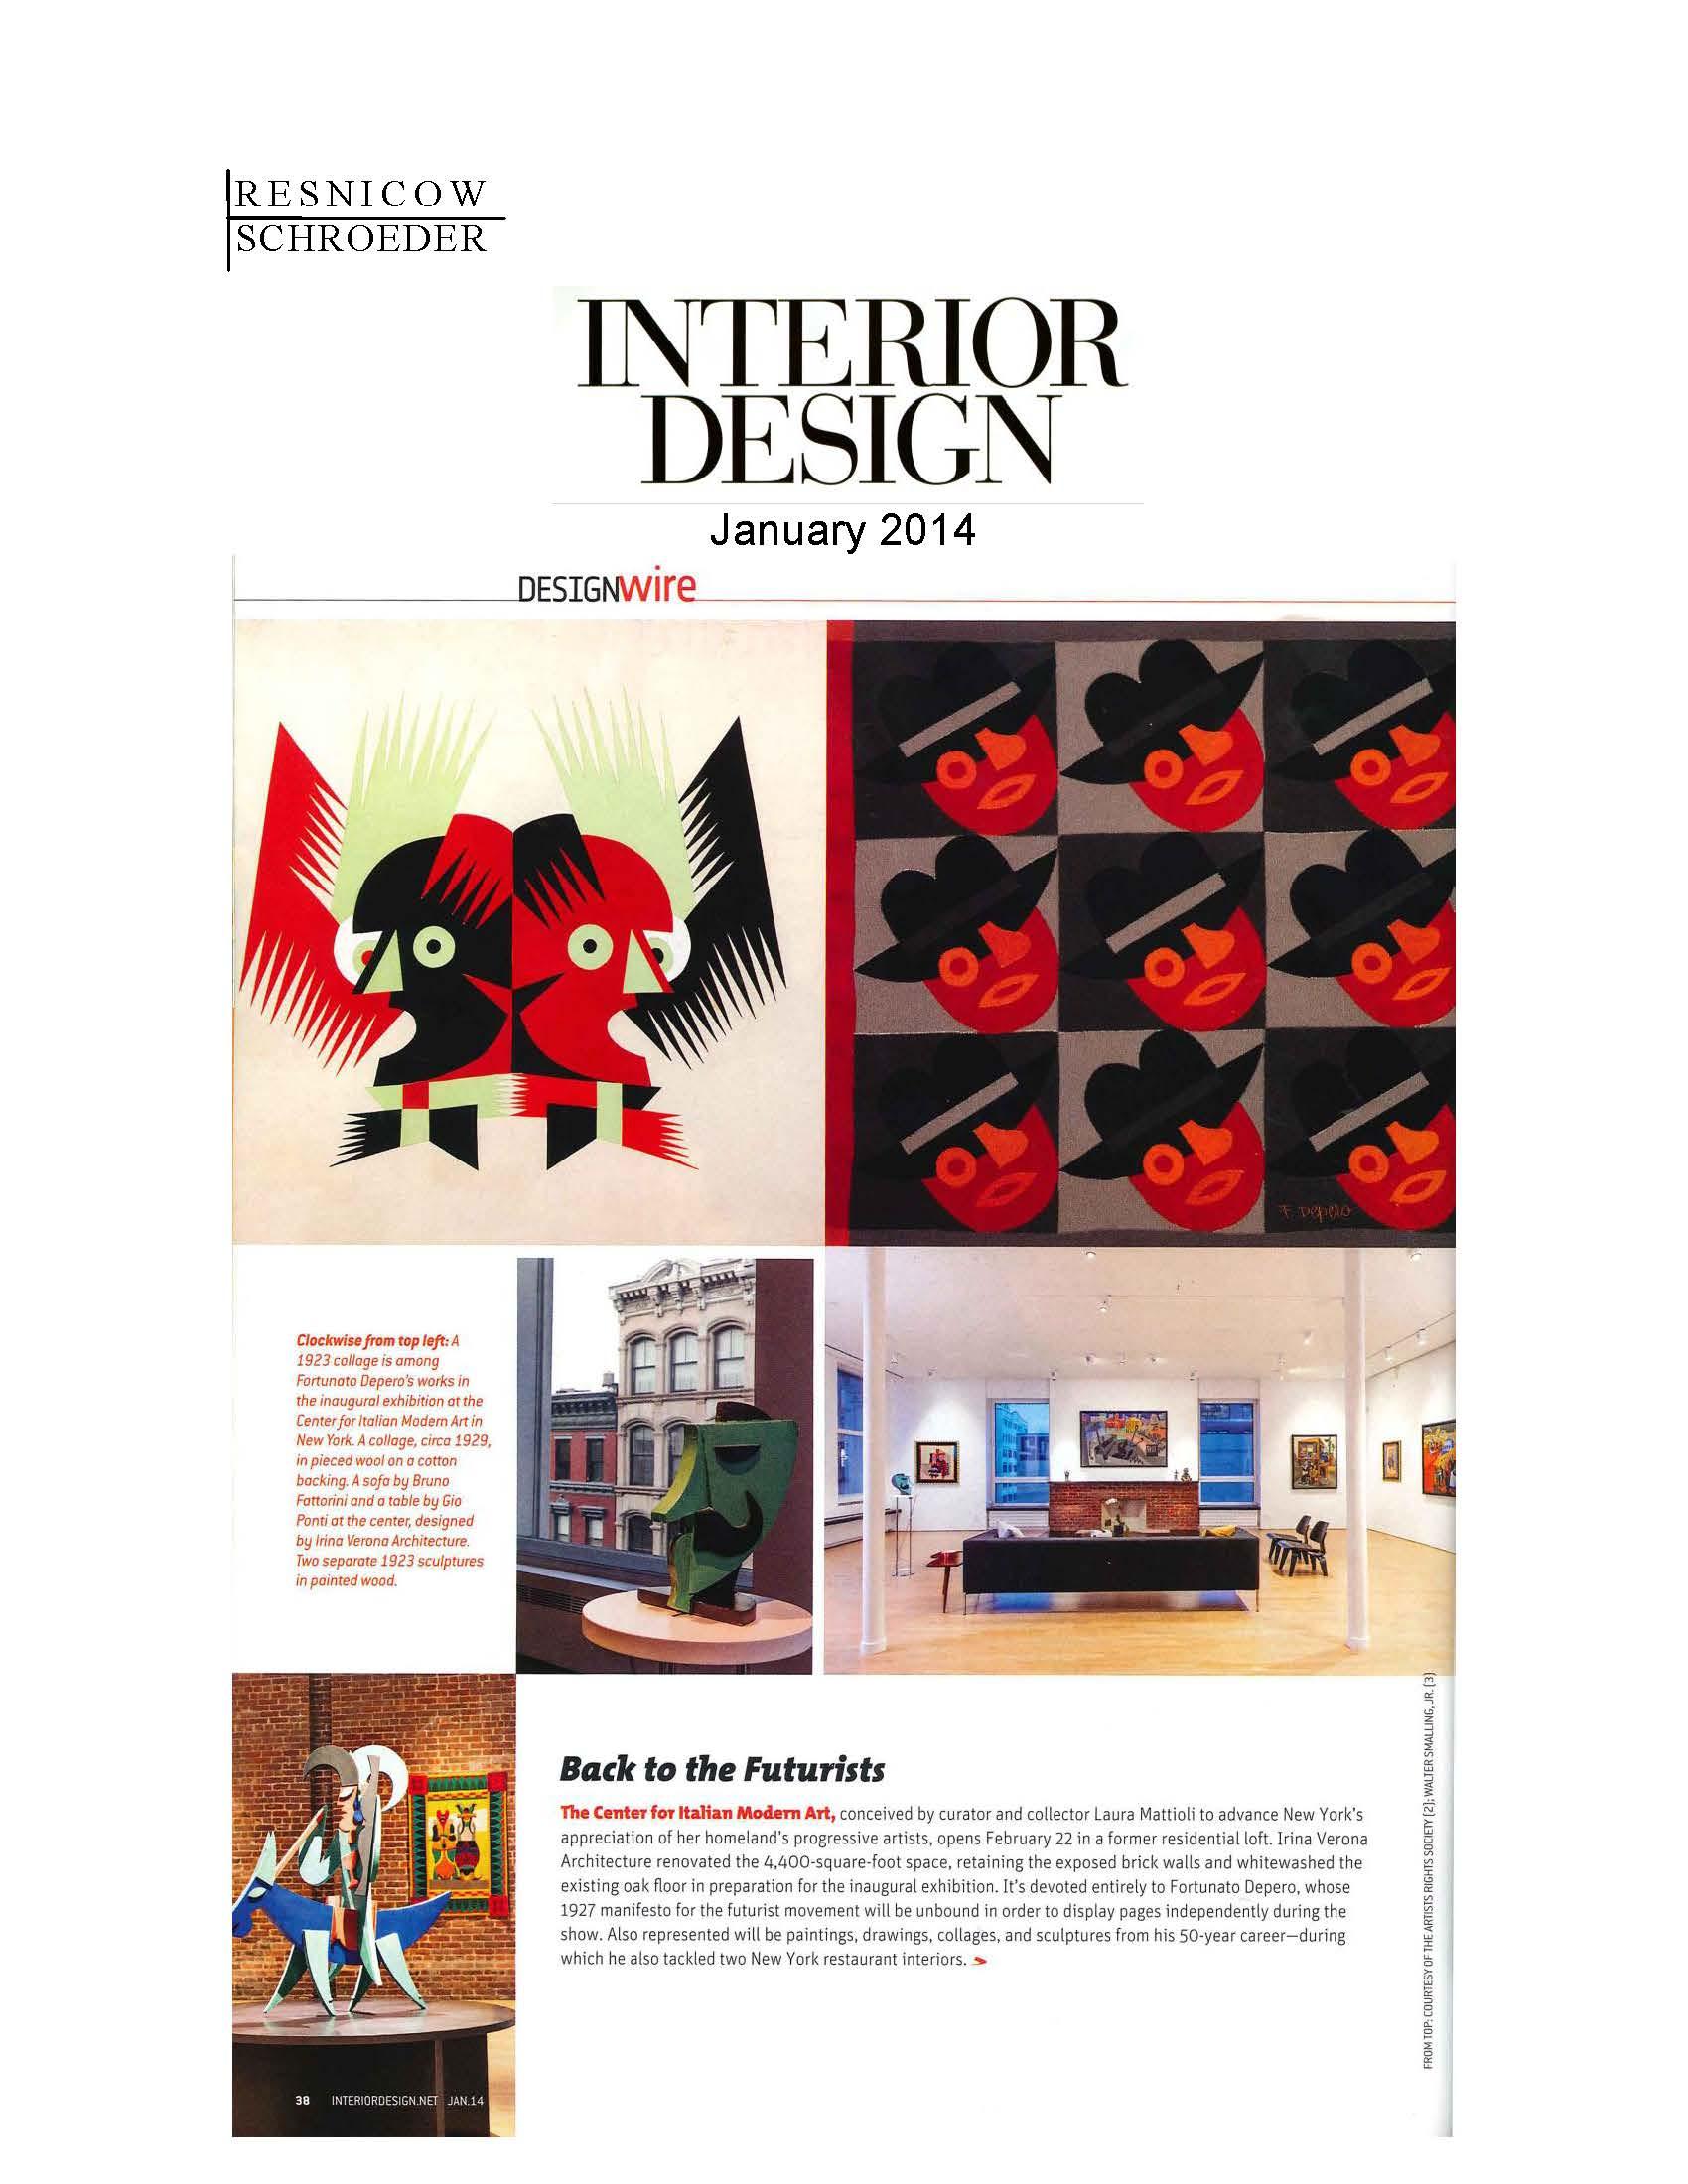 2014 January Interior Design - Design Wire (1).jpg